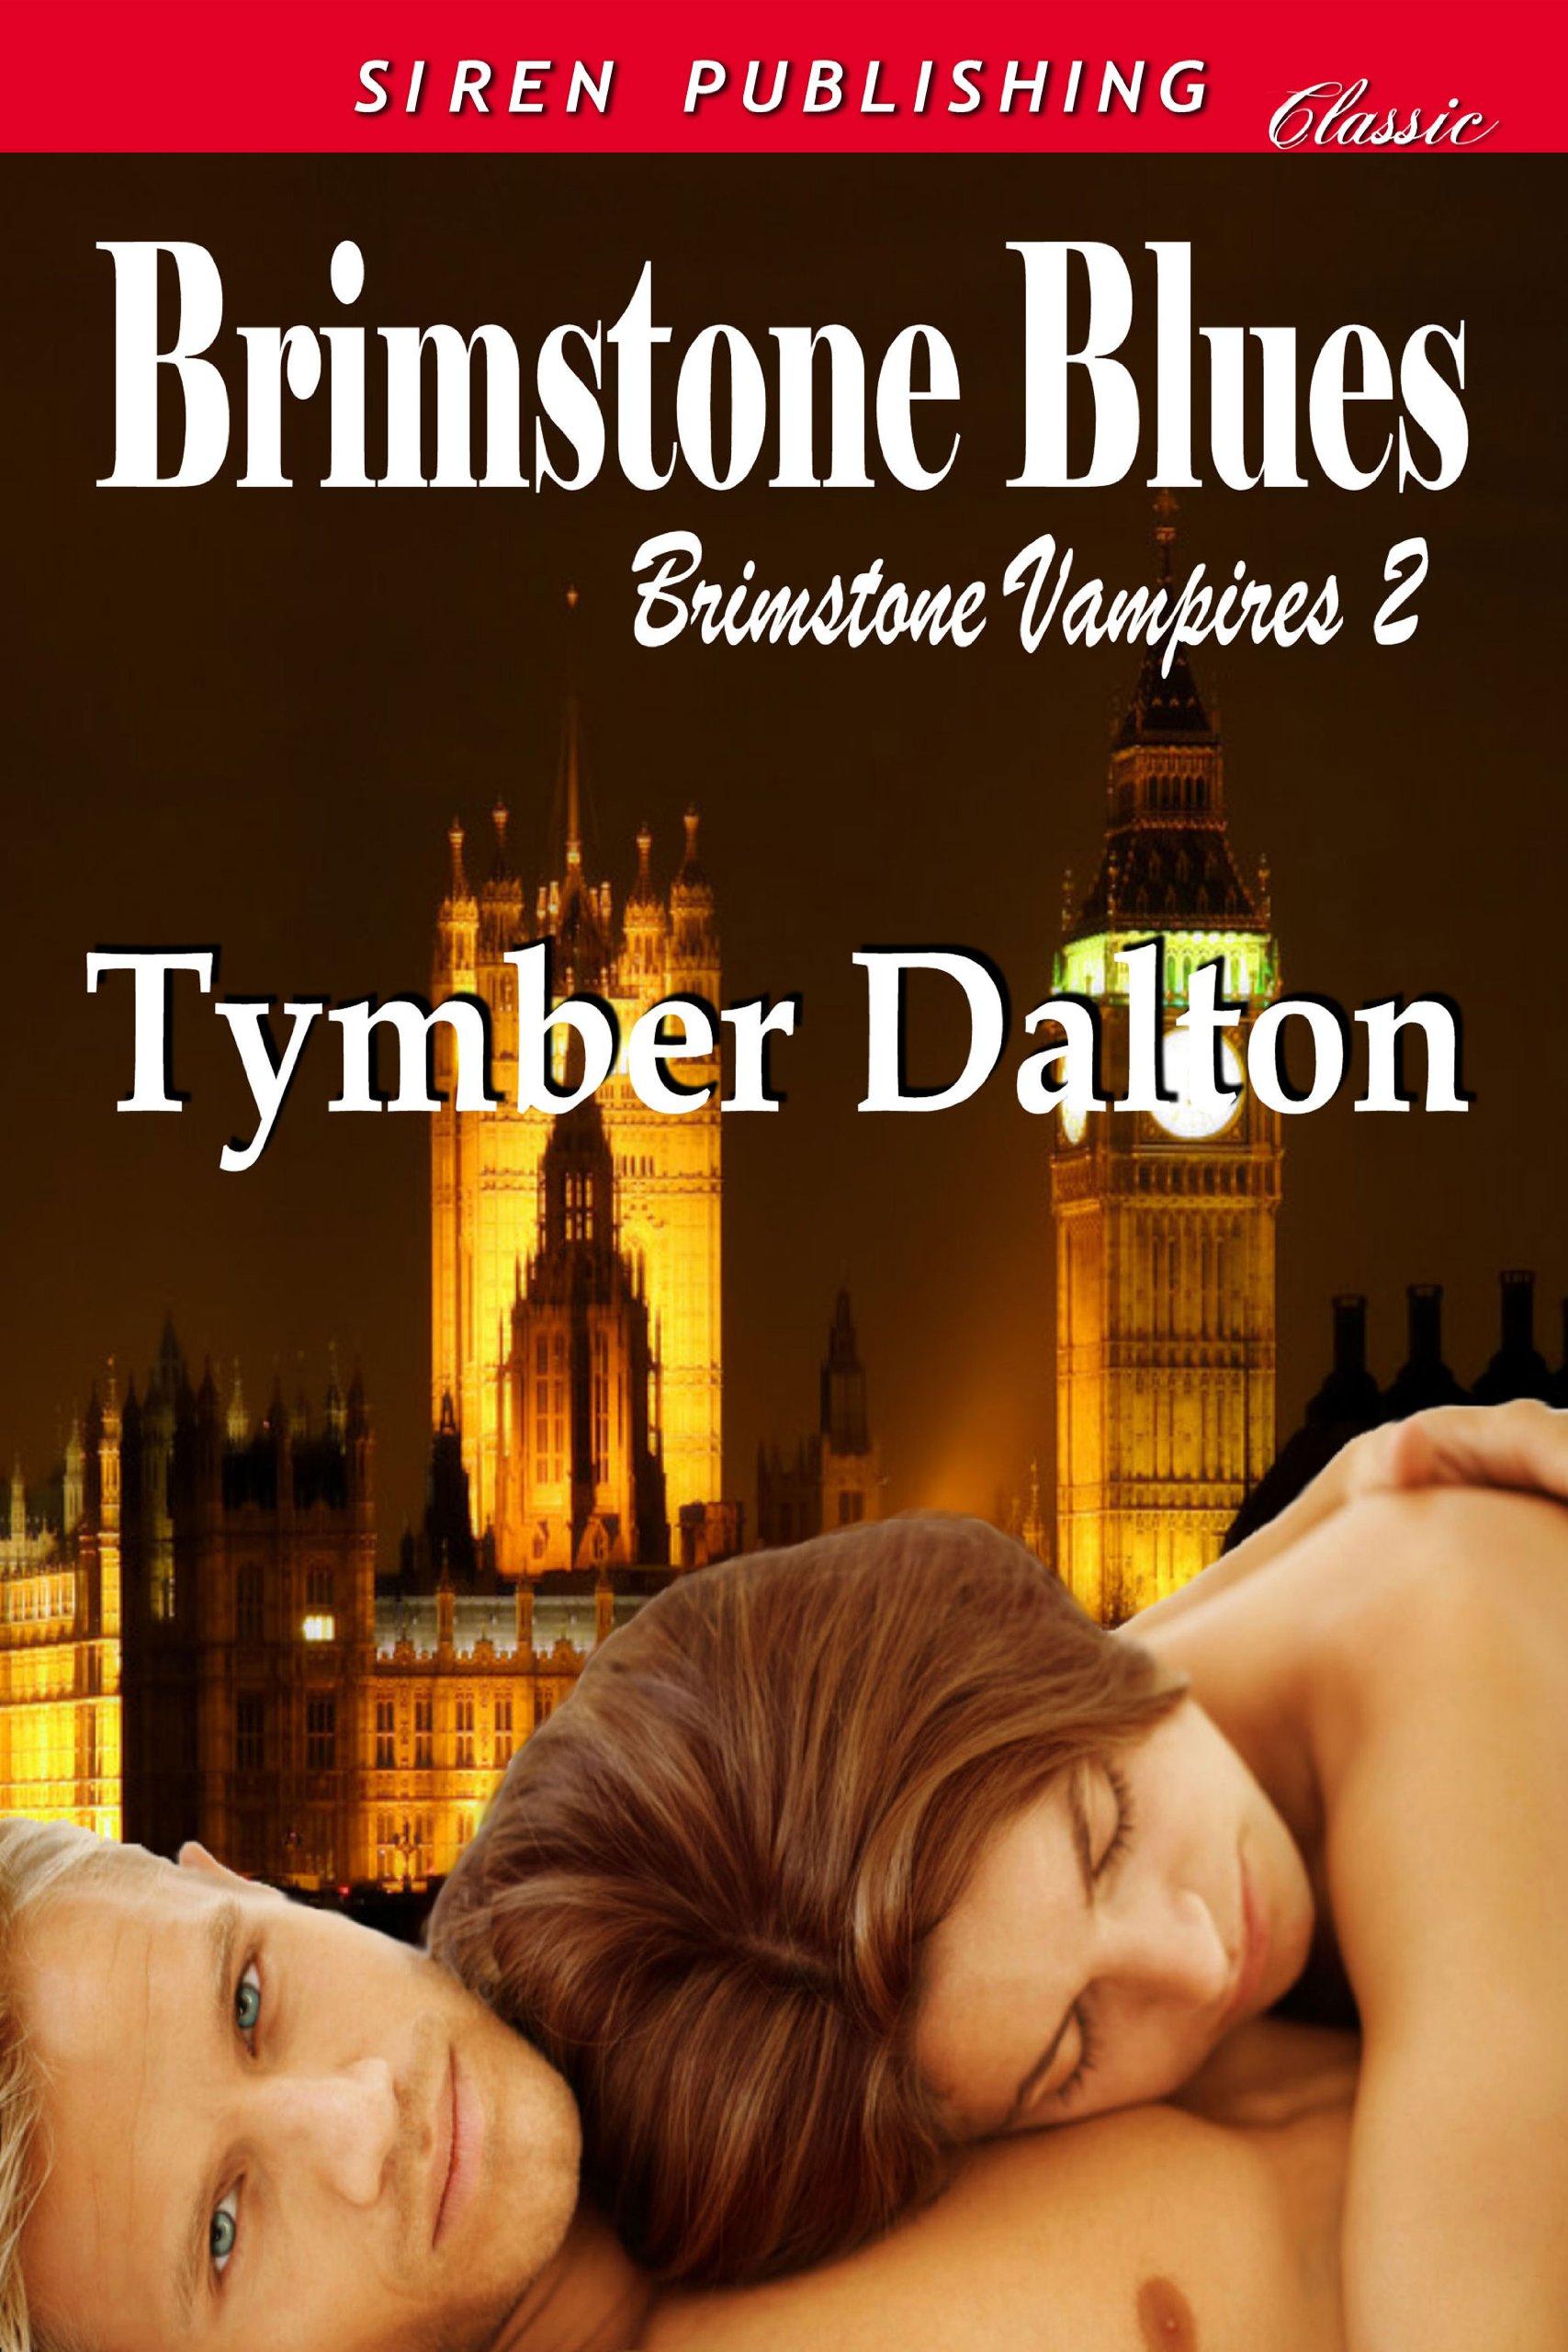 Read Online Brimstone Blues [Brimstone Vampires 2] (Siren Publishing Classic) pdf epub